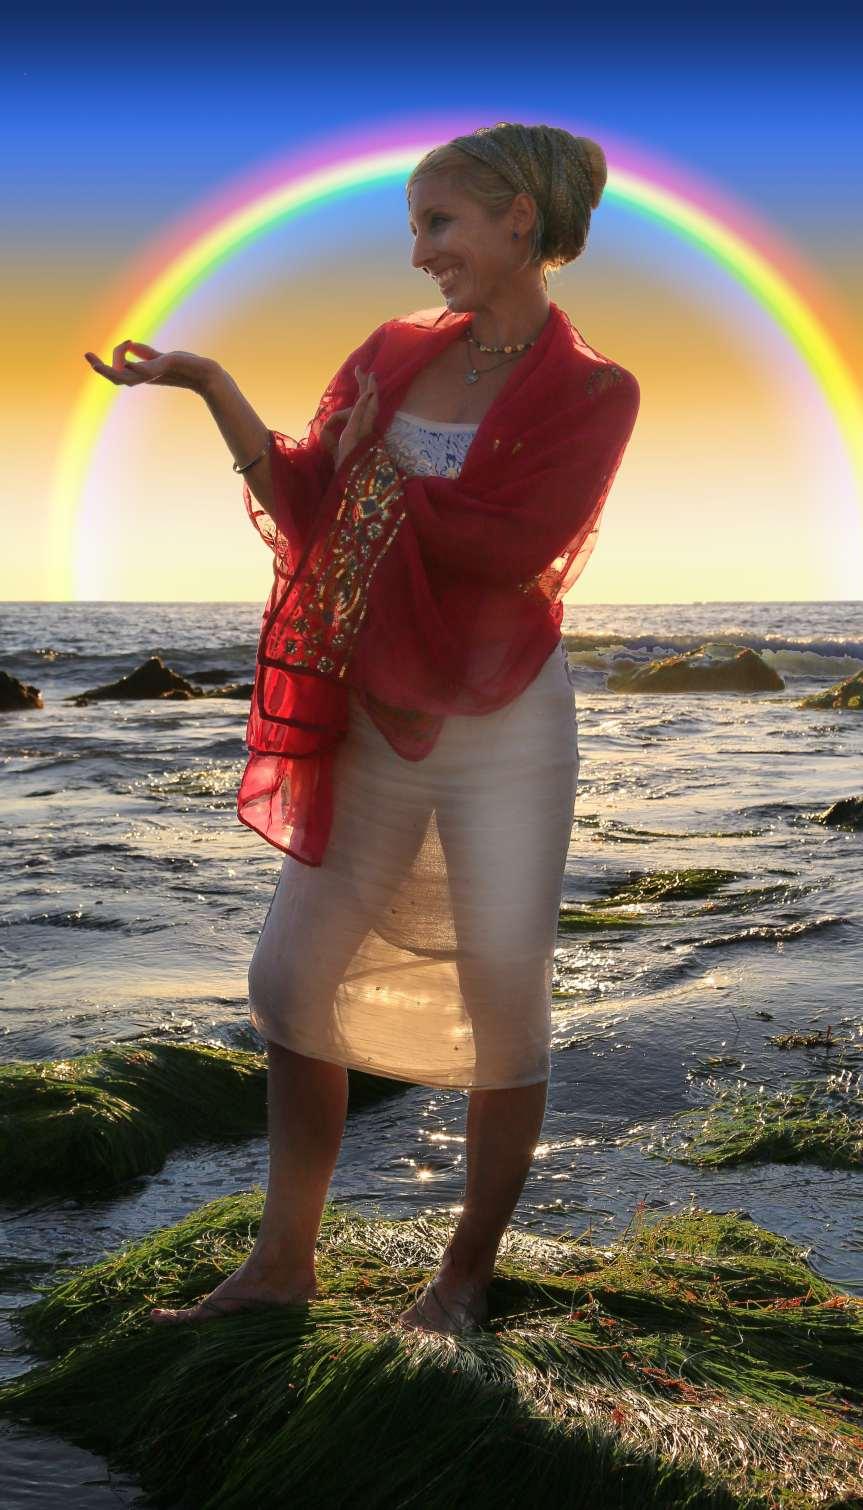 Rainbow Energy Healing